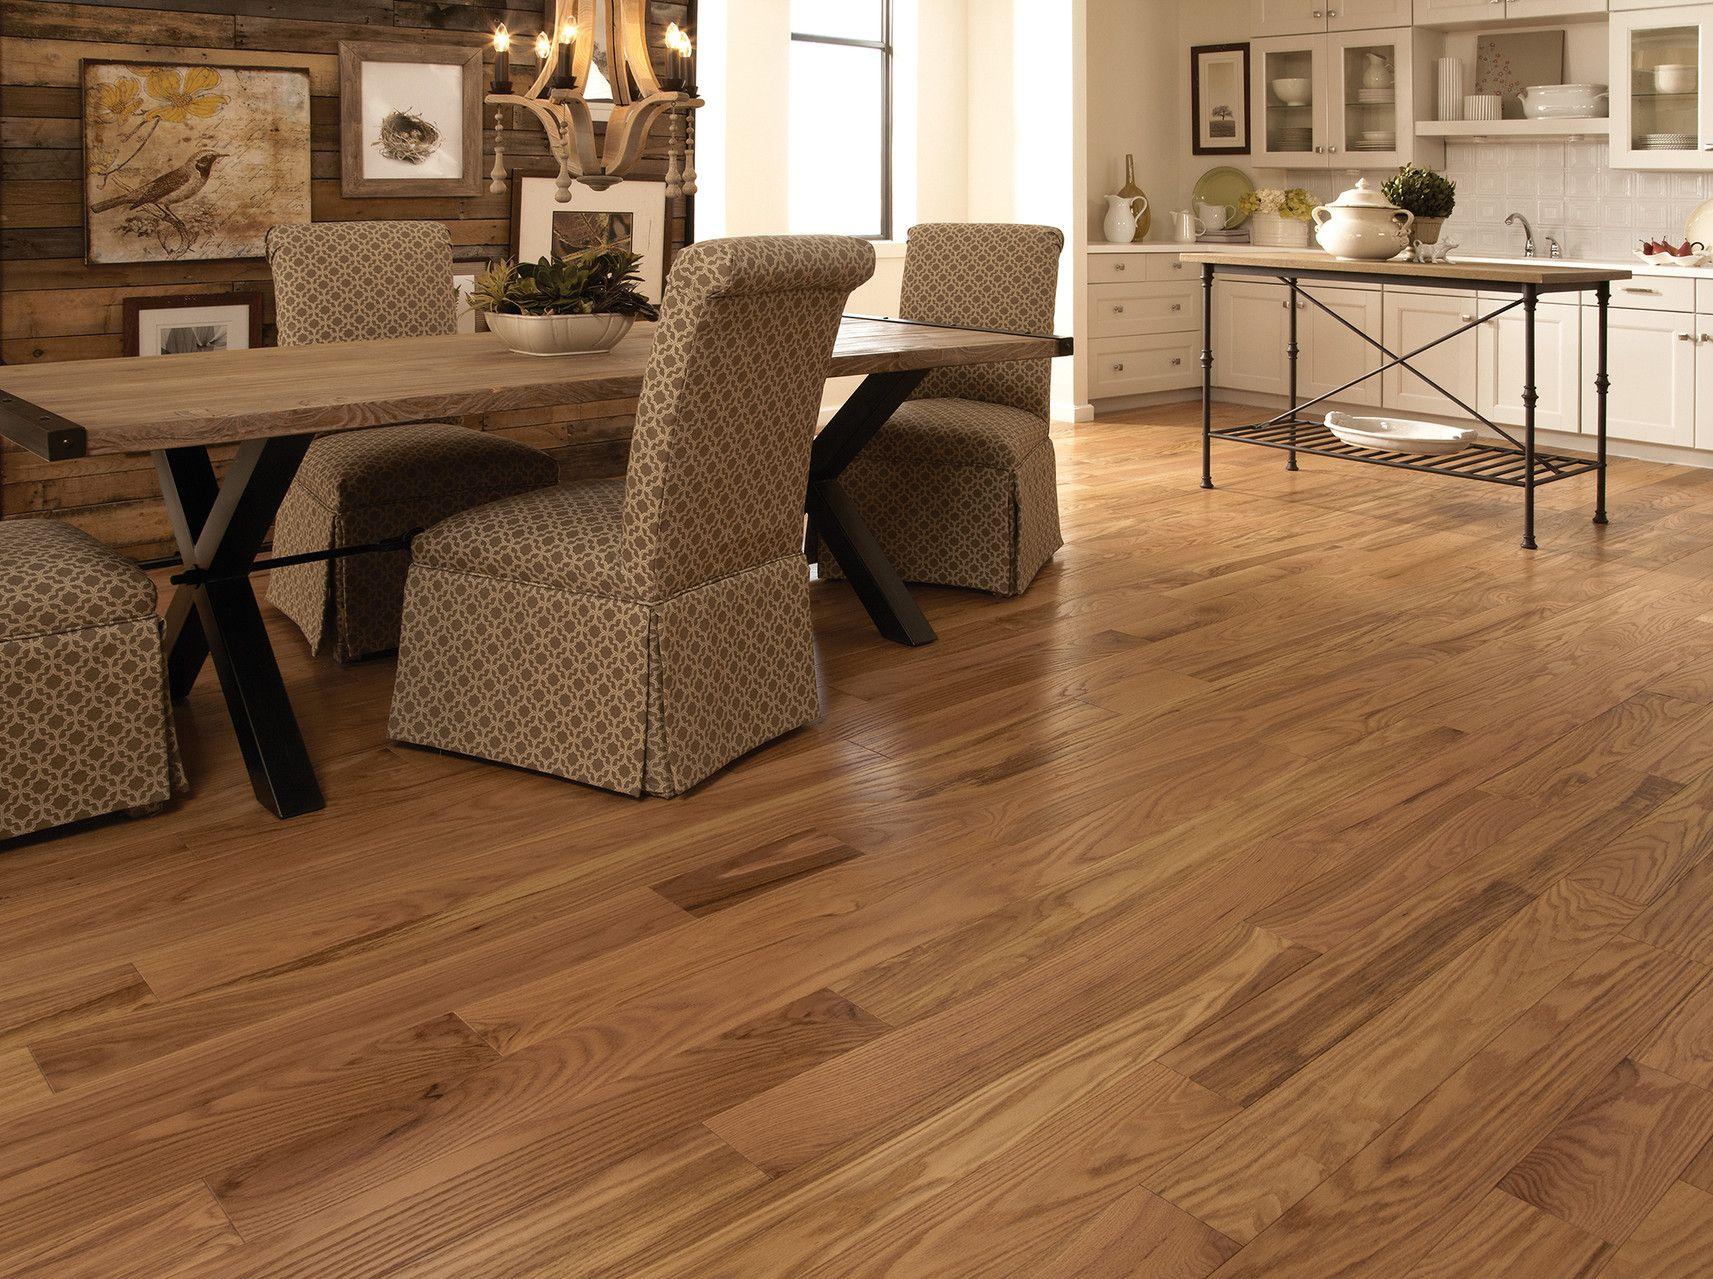 Galleries Engineered Hardwood Flooring Solid Hardwood Floors Somerset Hardwood